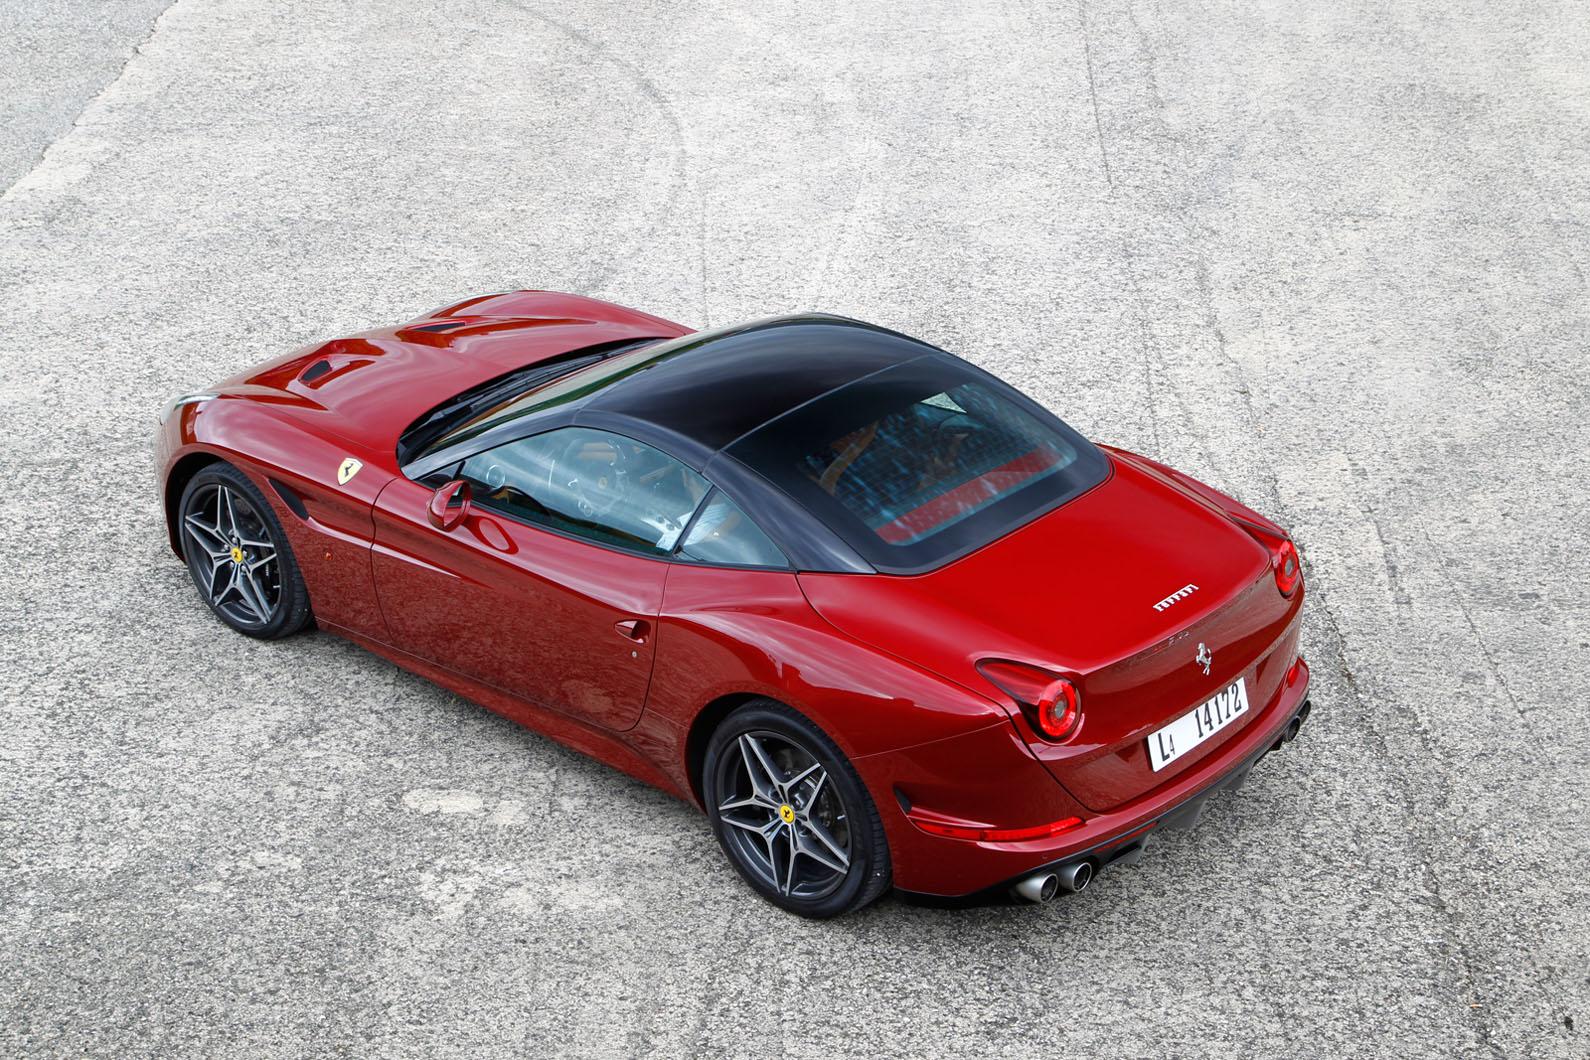 The new Ferrari California T costs around £150,000